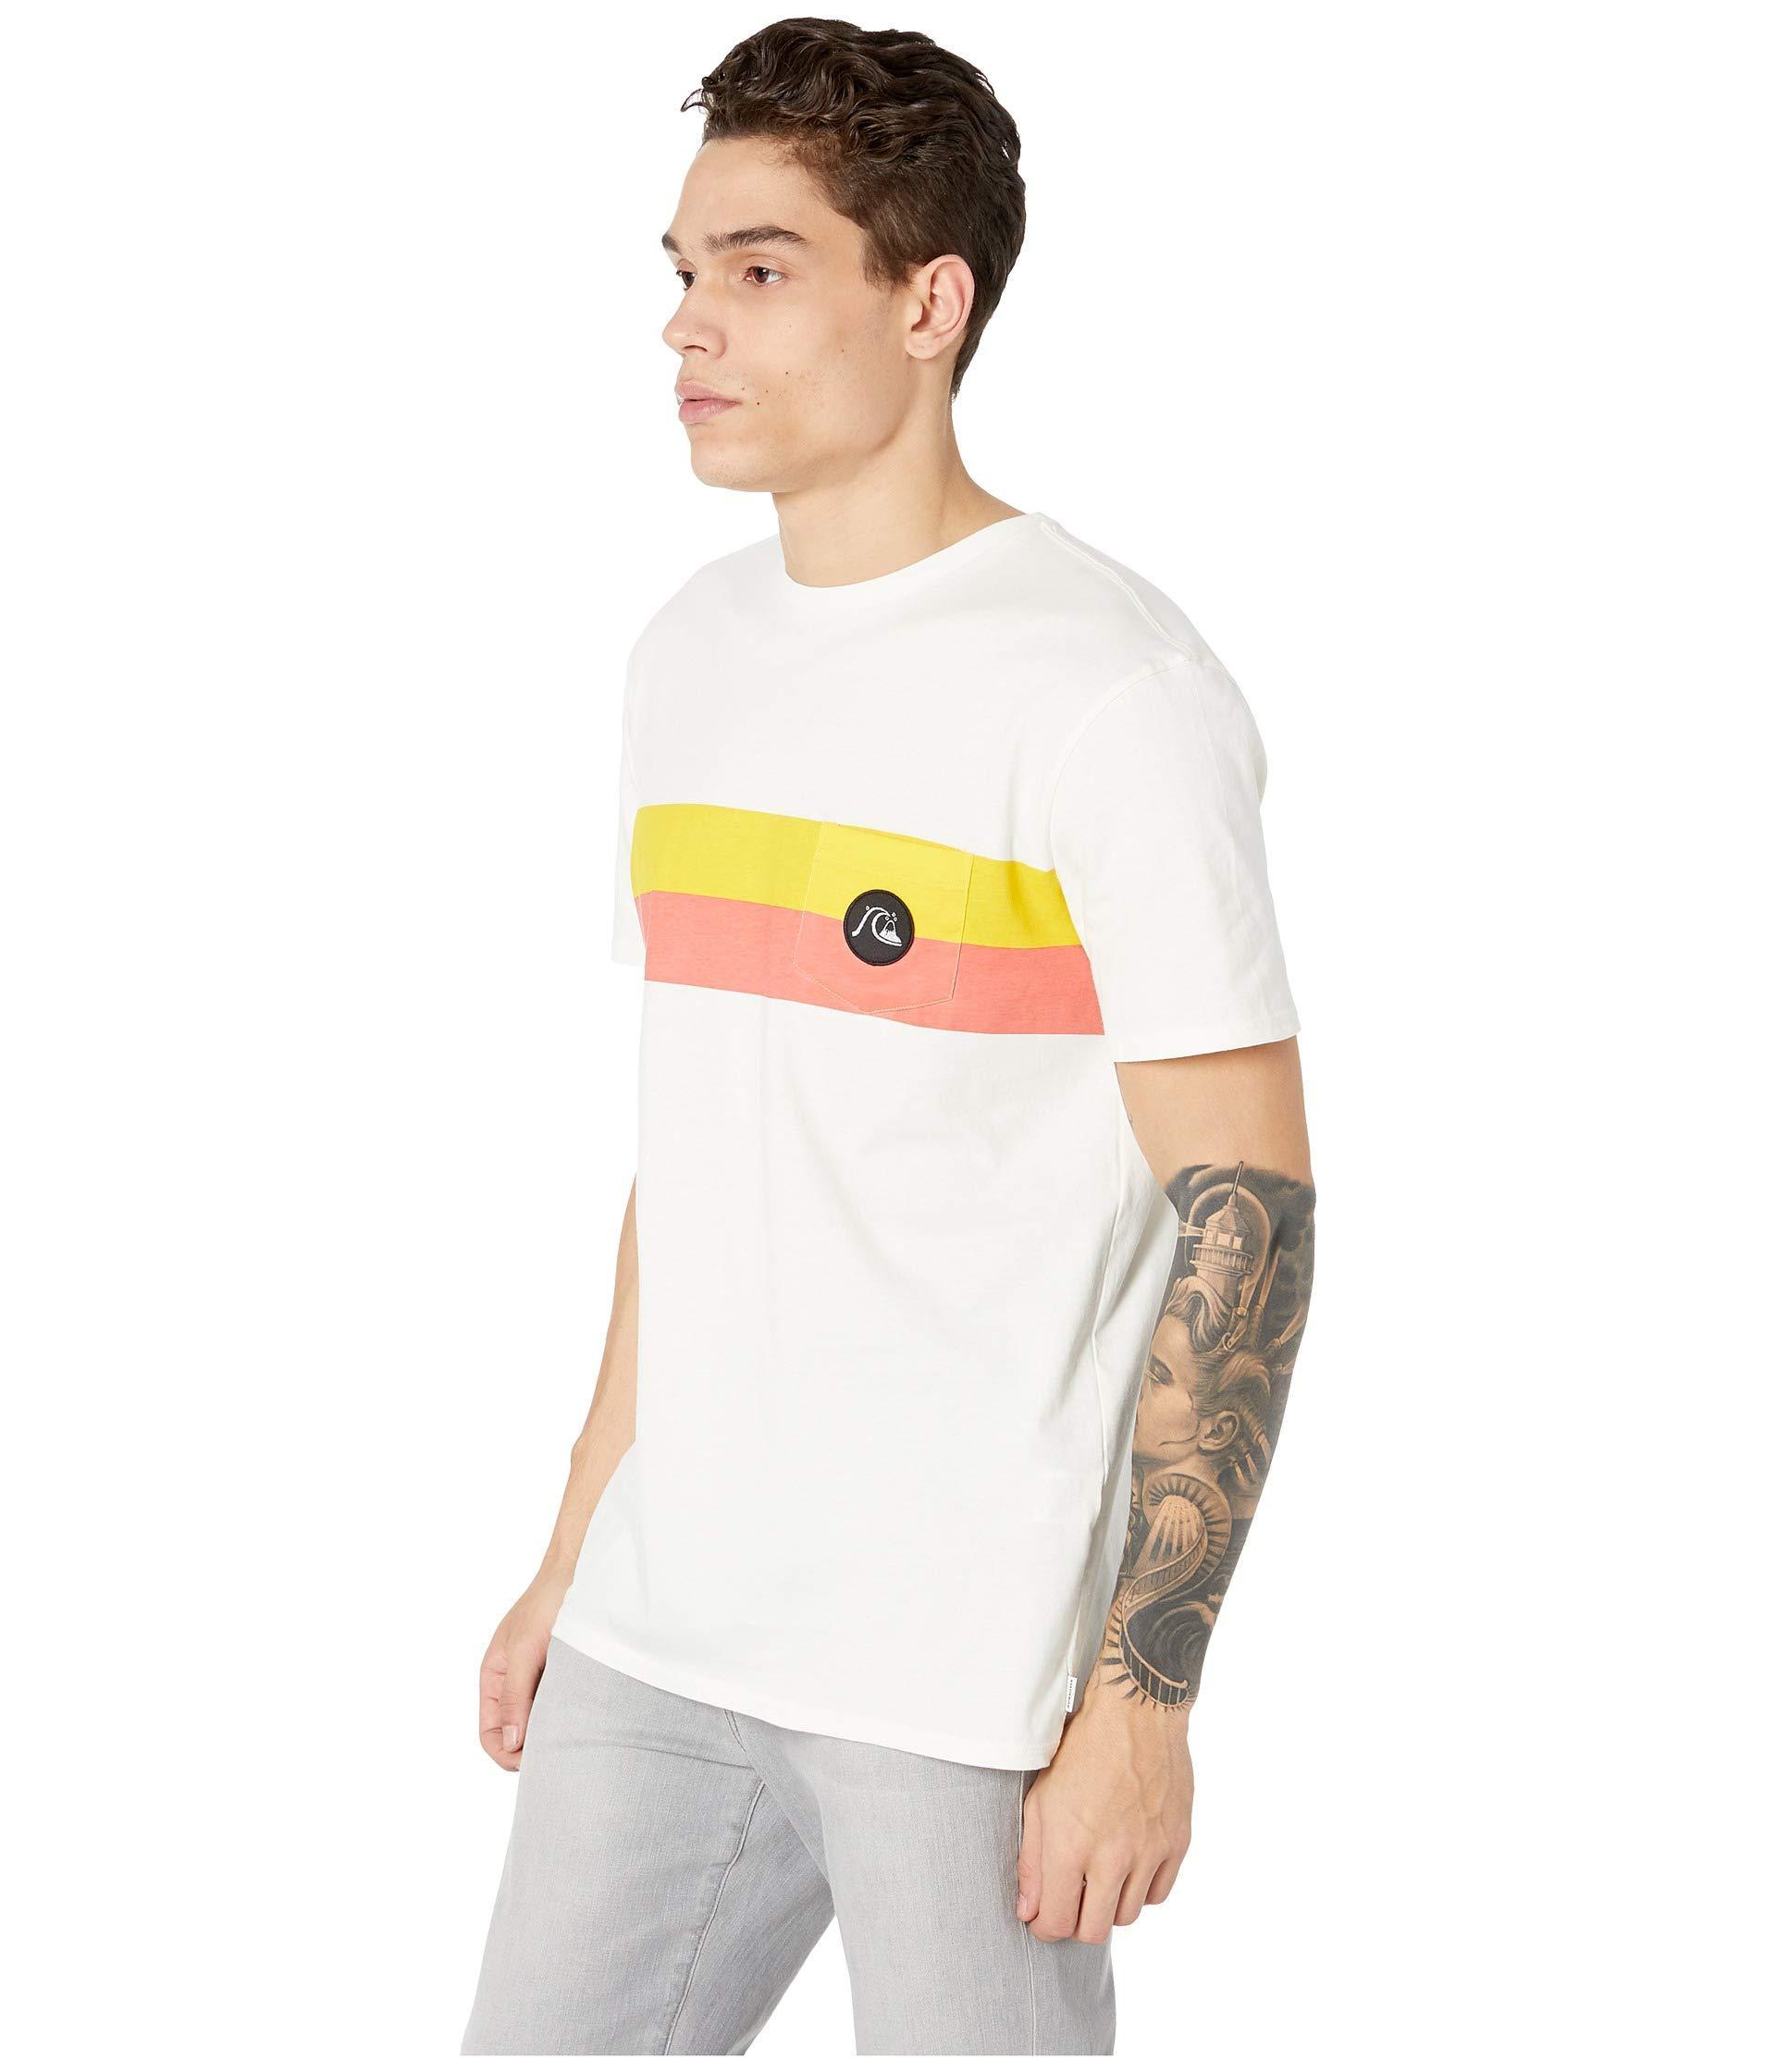 d990710c6f936 quiksilver-Gardenia-Season-Stripe-Pocket-Tee-gardenia-Mens-T-Shirt.jpeg